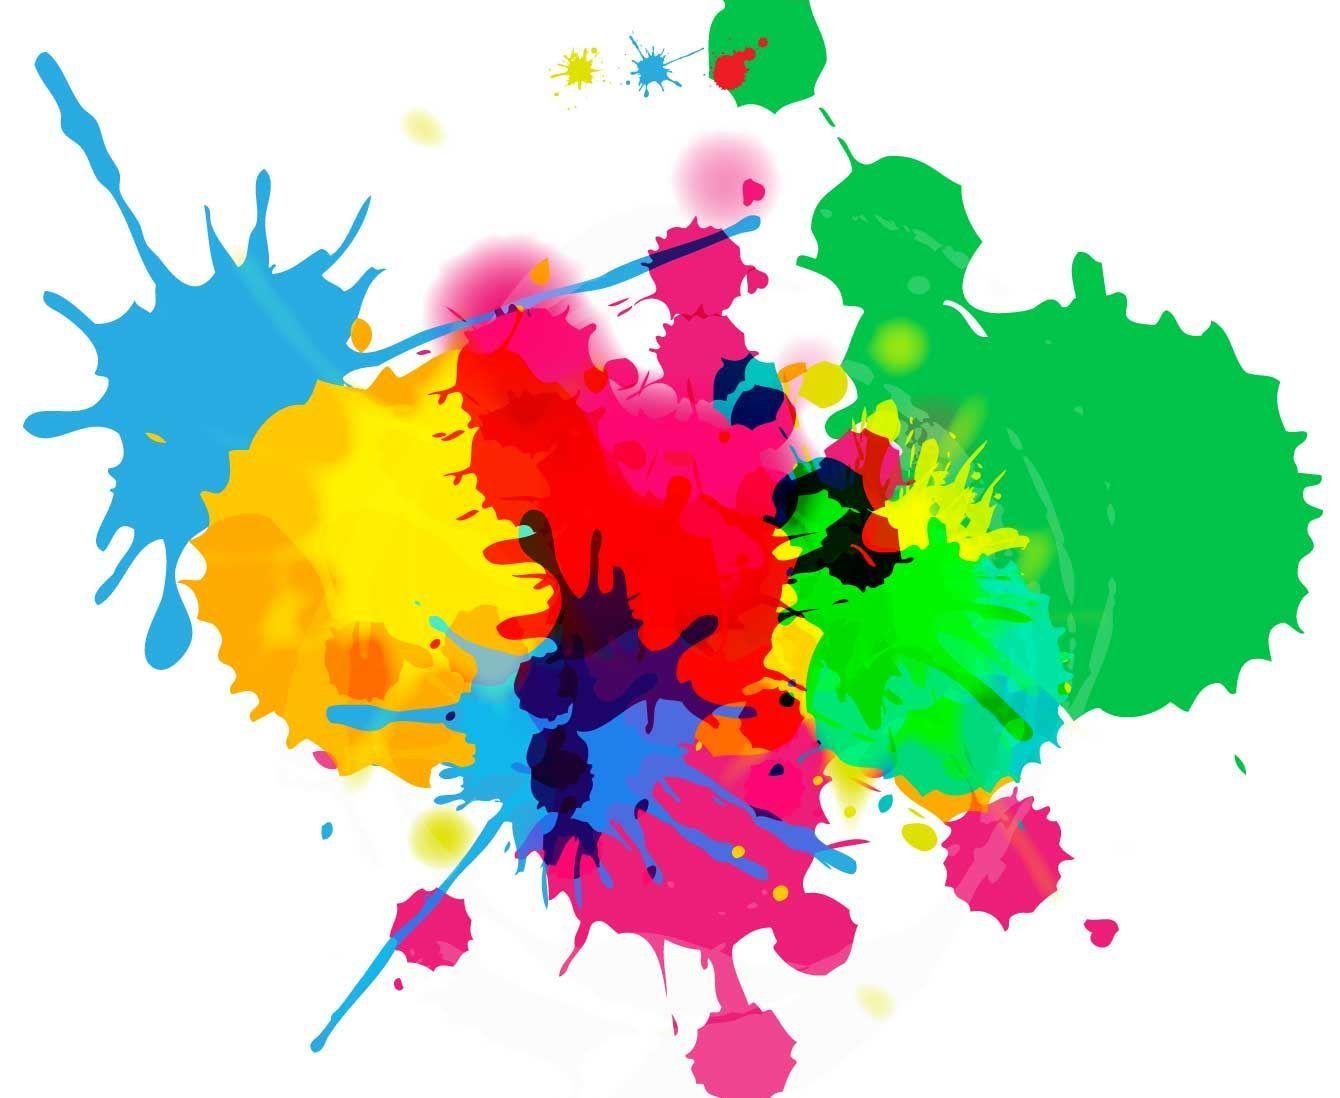 Color Graphic Design: Web Design Colors Usage For Successful Websites